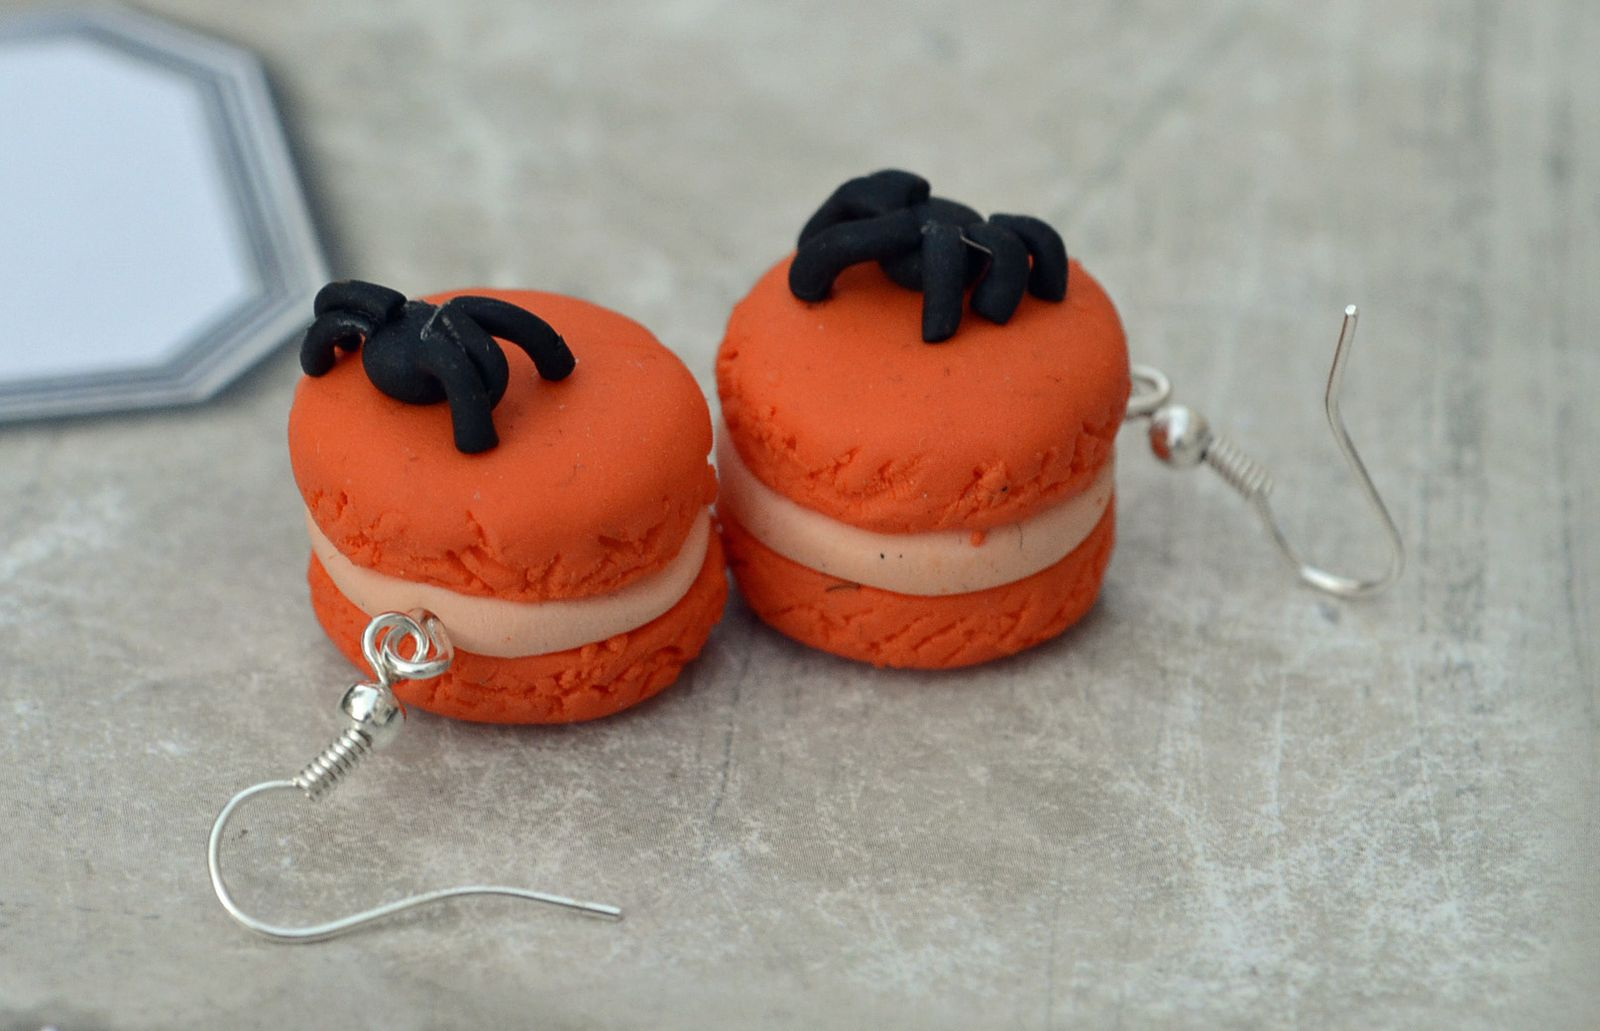 Bijoux en p te fimo pour halloween creation de rosalila - Idee creation pate fimo ...